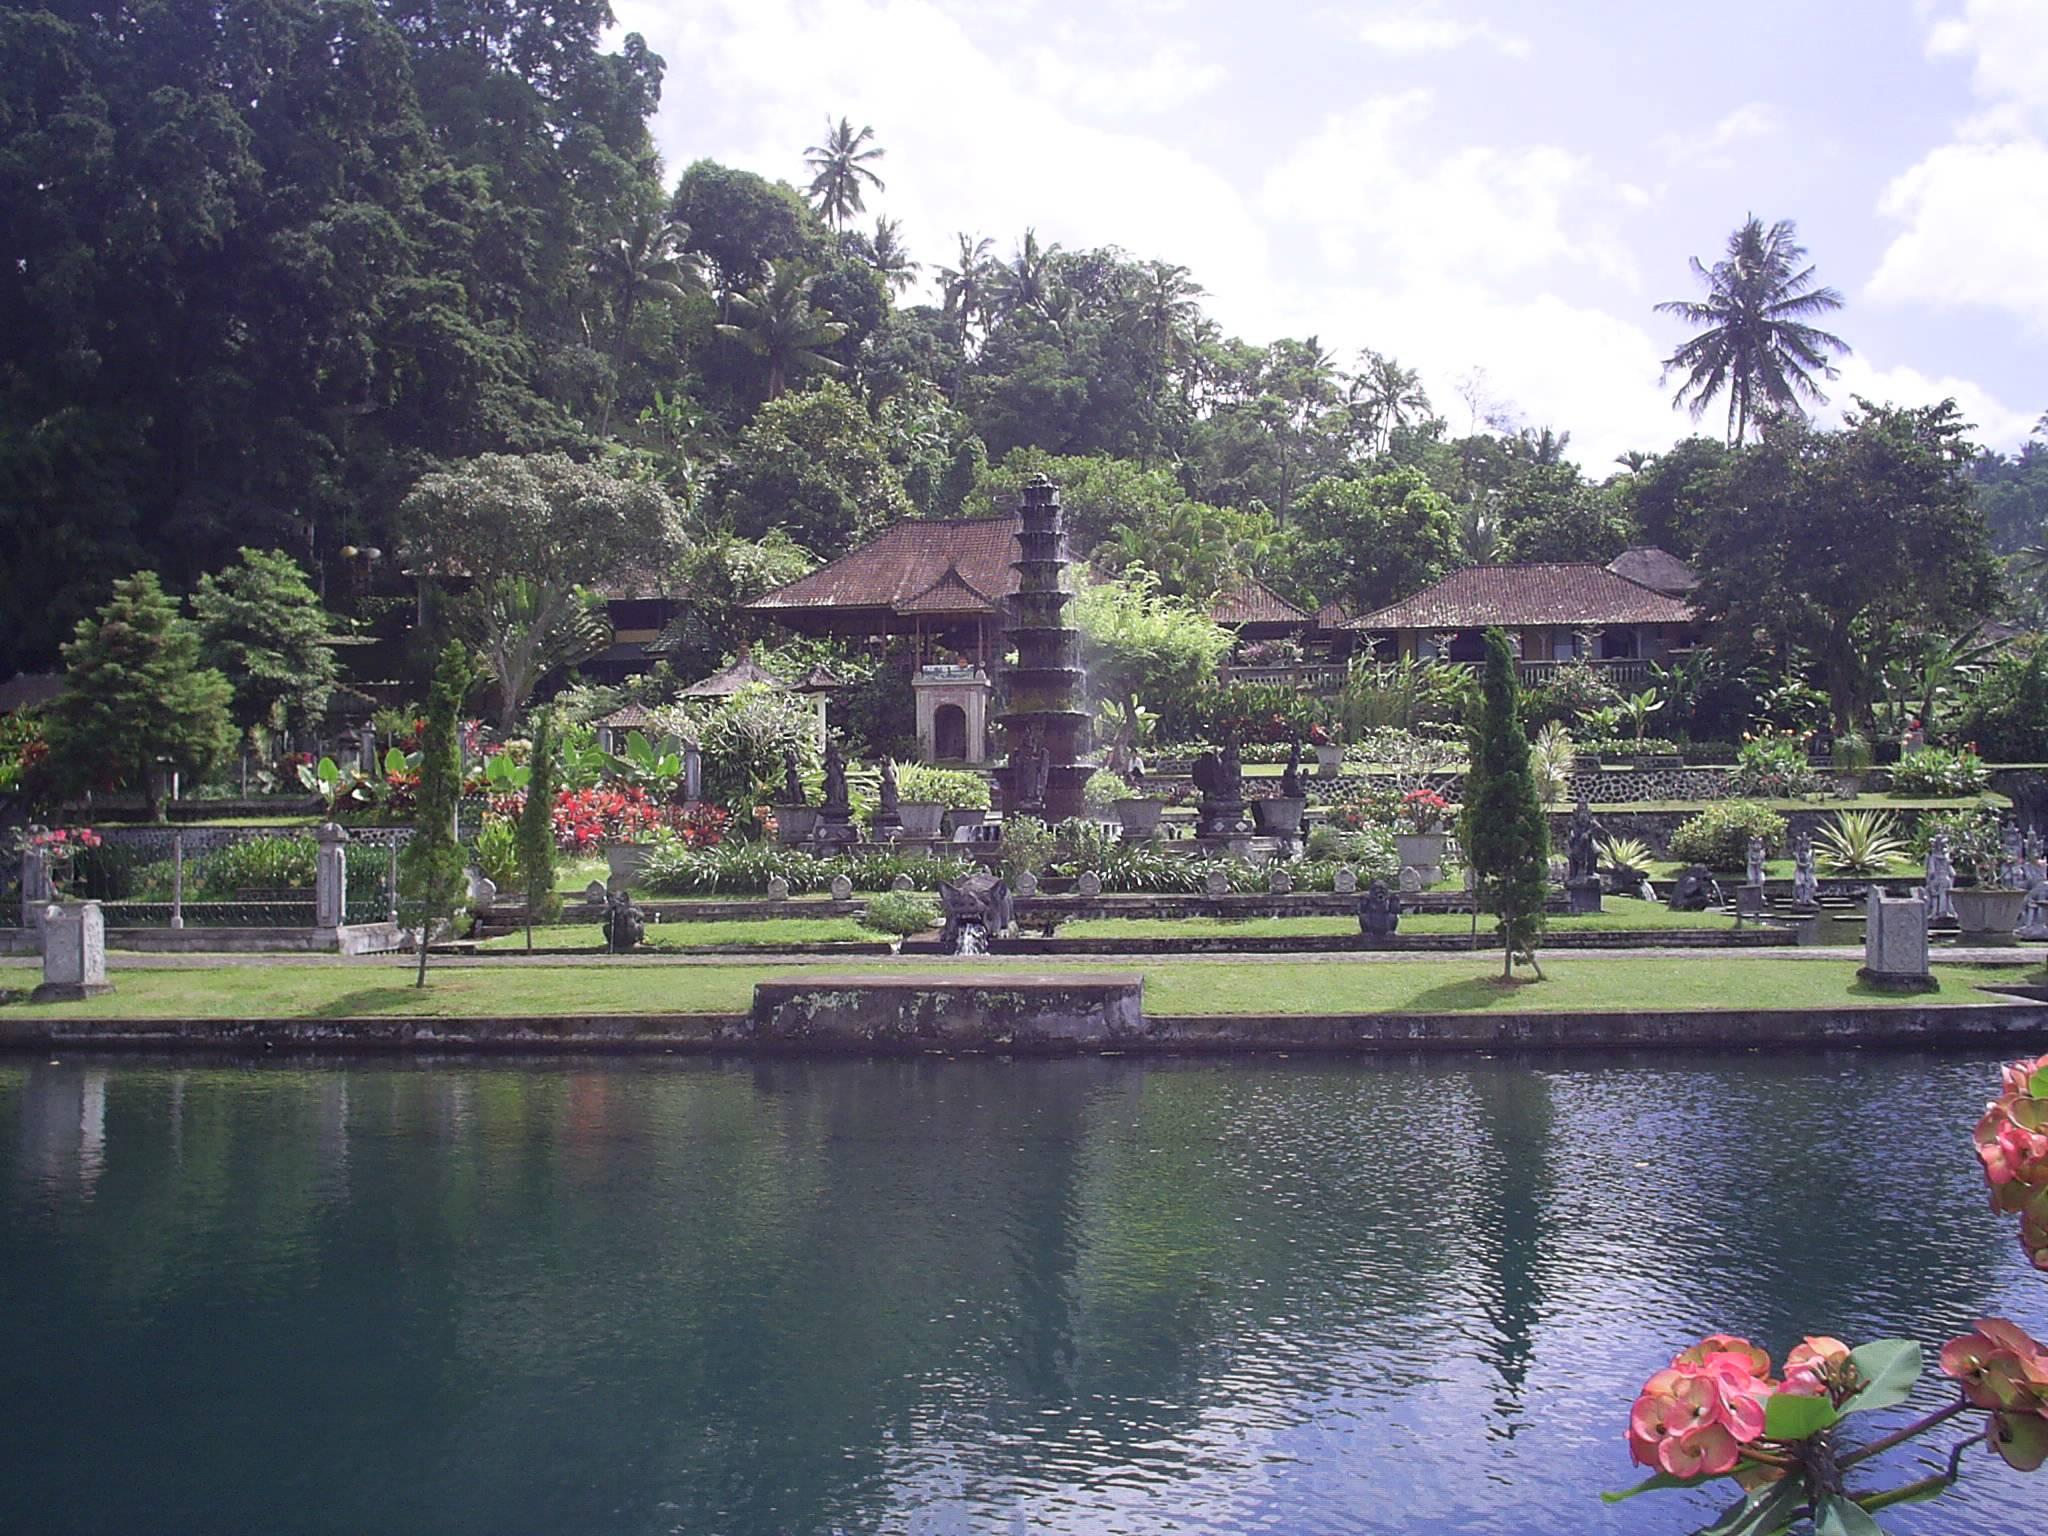 Photo 1: Tirta Gangga, le palais de l'eau